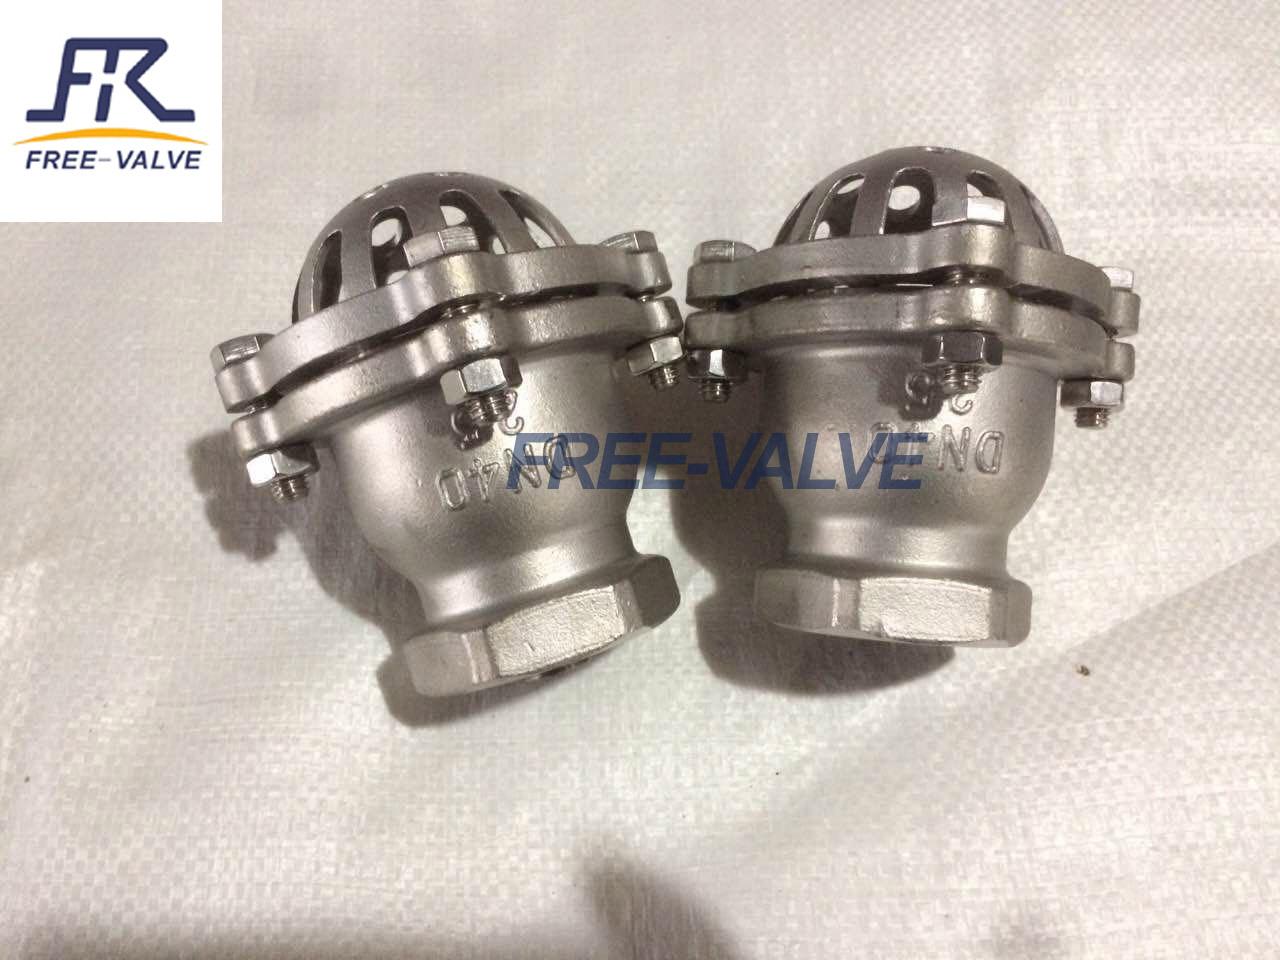 Stainless Steel Bottom Valve Lift Check Valve Screwed Foot Valve